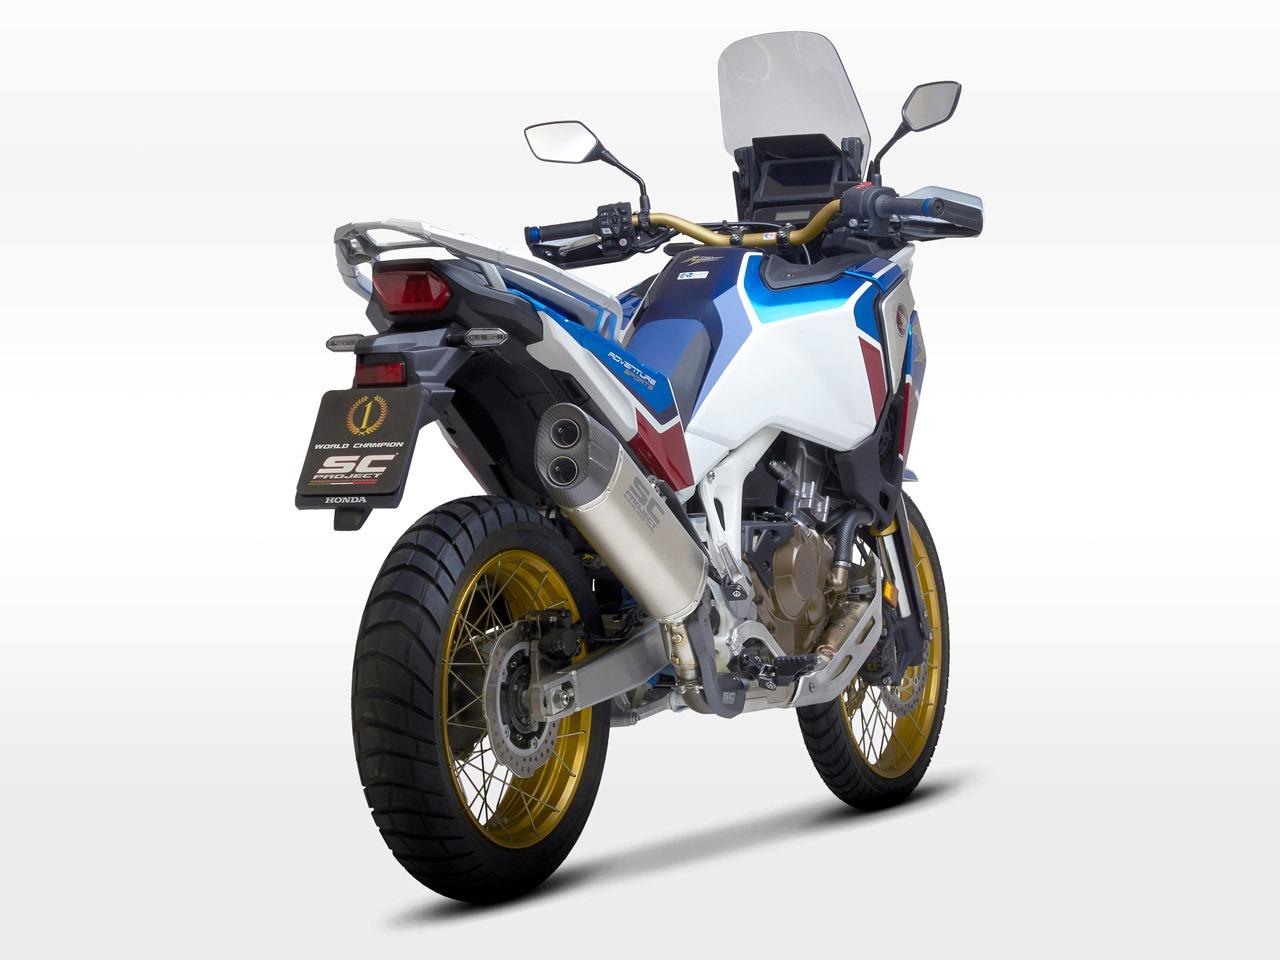 Honda_CRF1100L-AfricaTwin_my2021_Adventure-Titanio_Posteriore_1280x960px_web-partnership